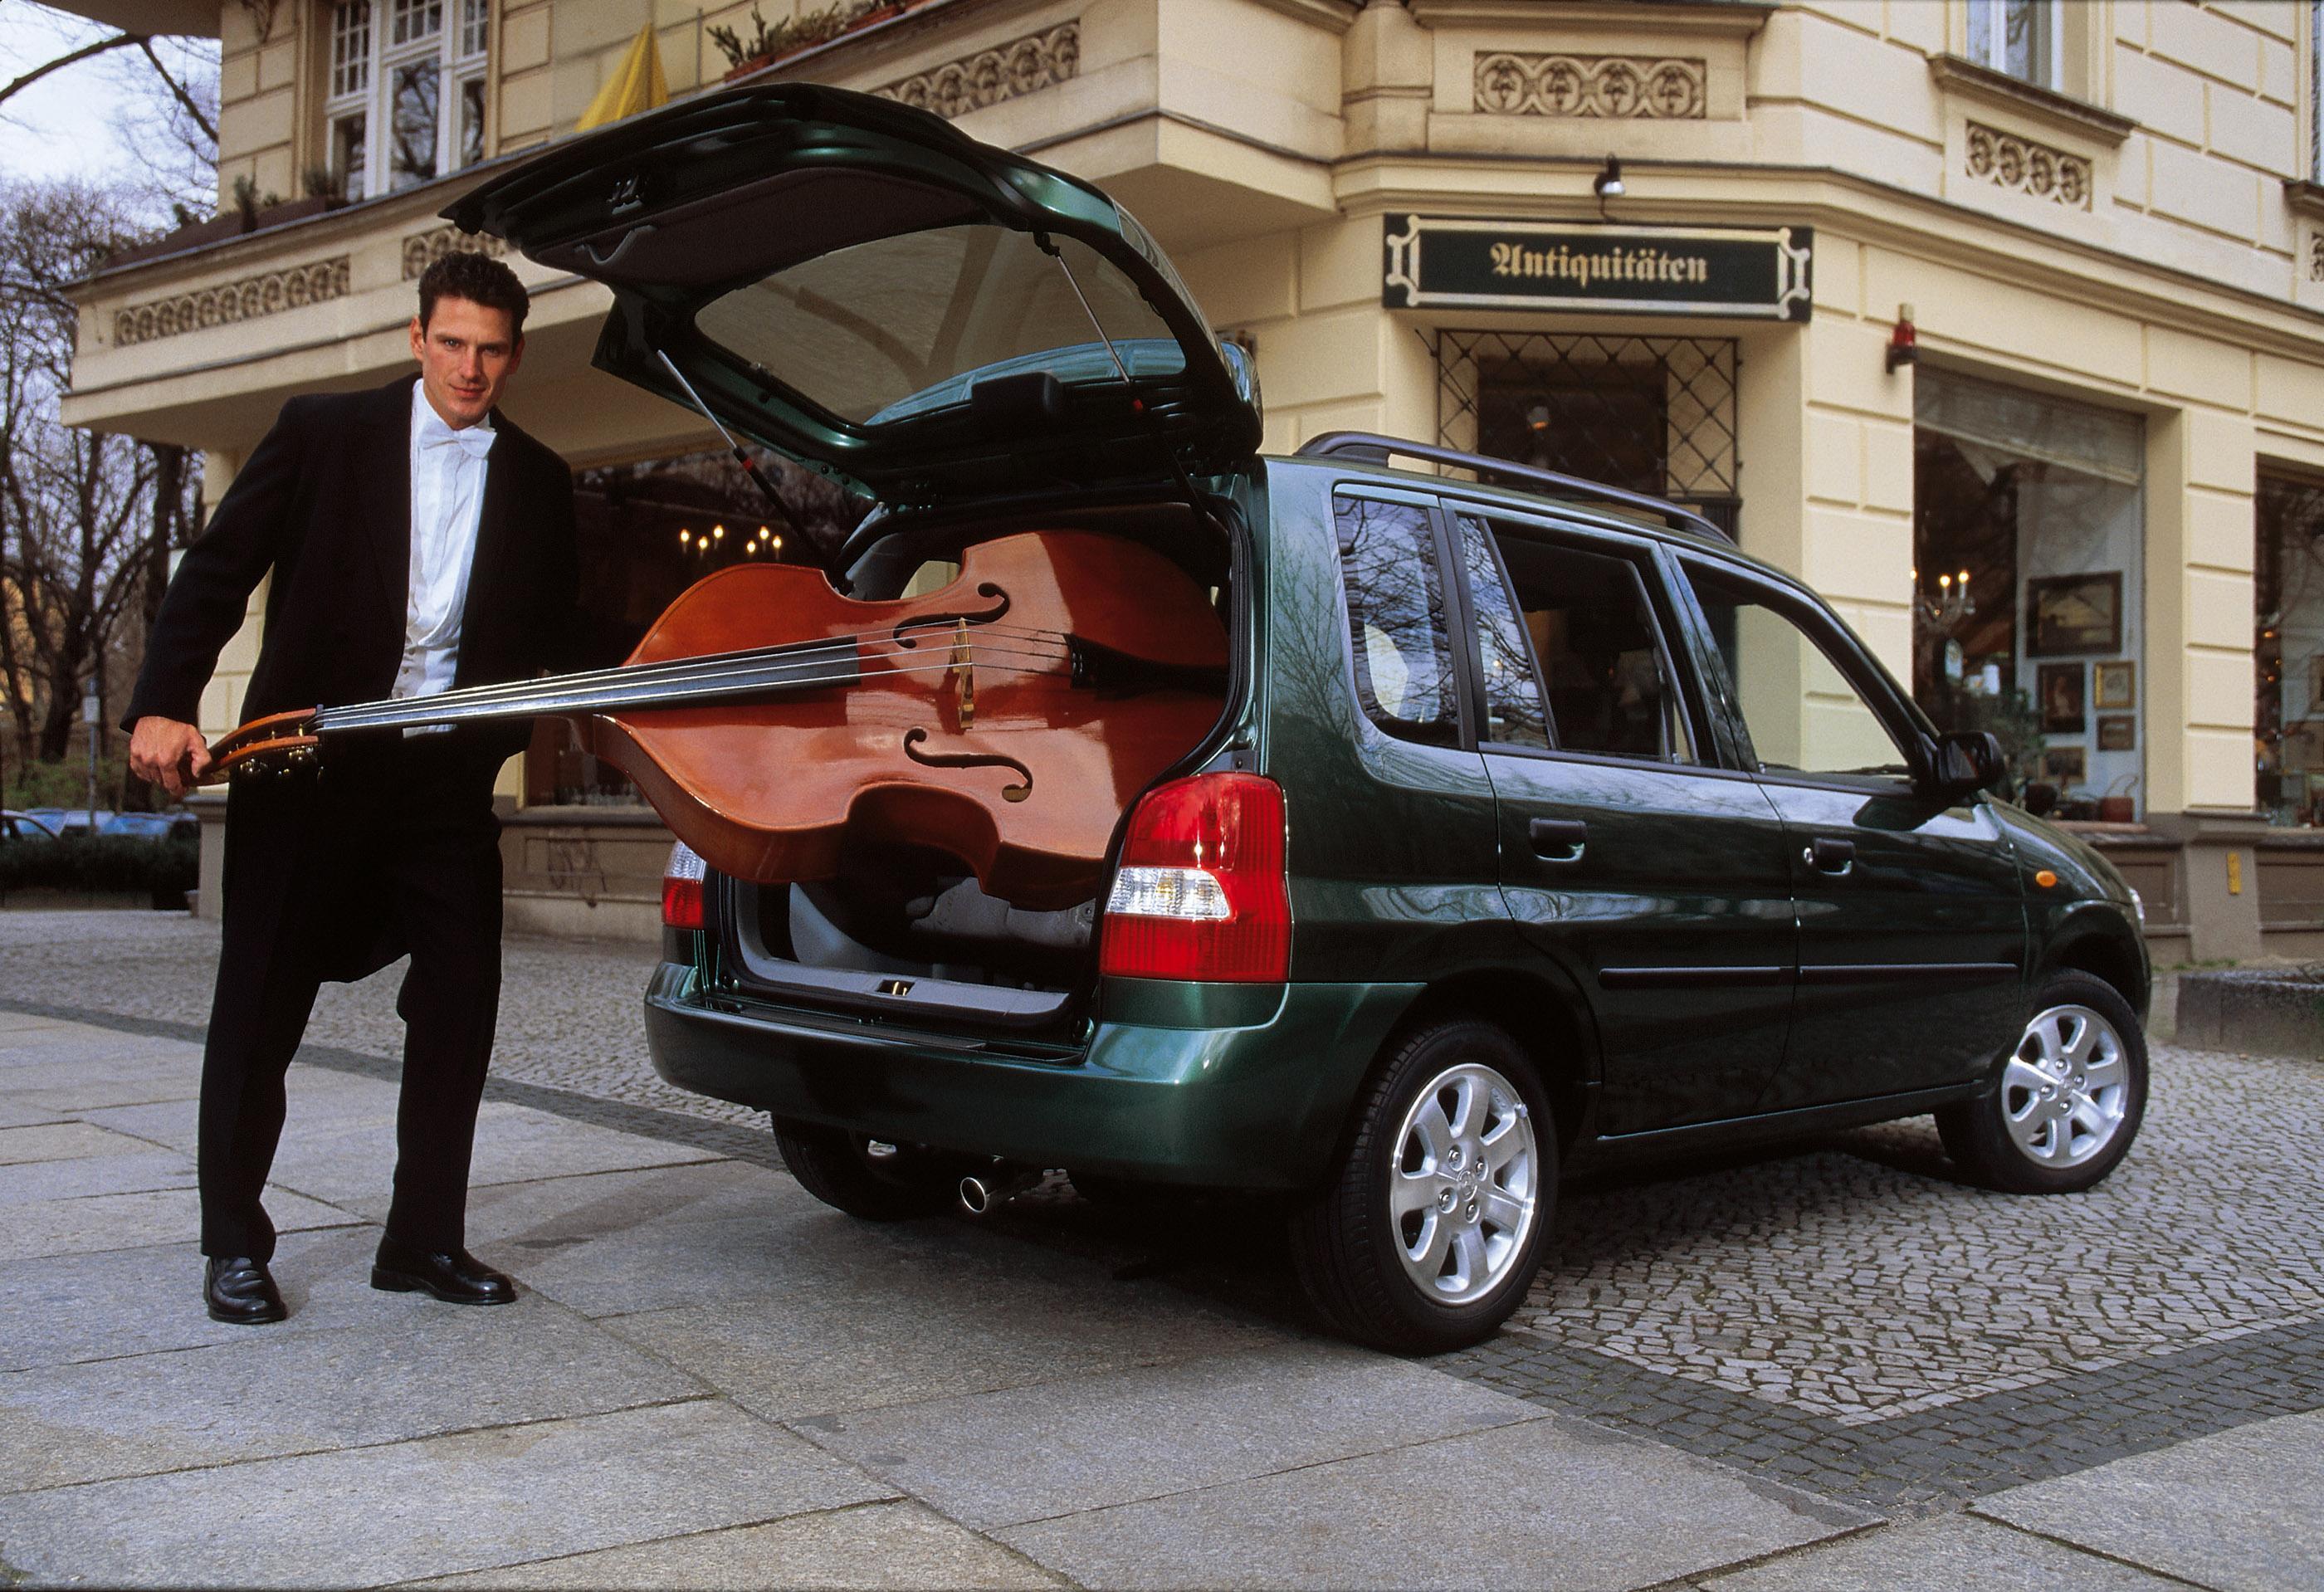 https://www.automobilesreview.com/gallery/2000-mazda-demio/2000-mazda-demio-14.jpg